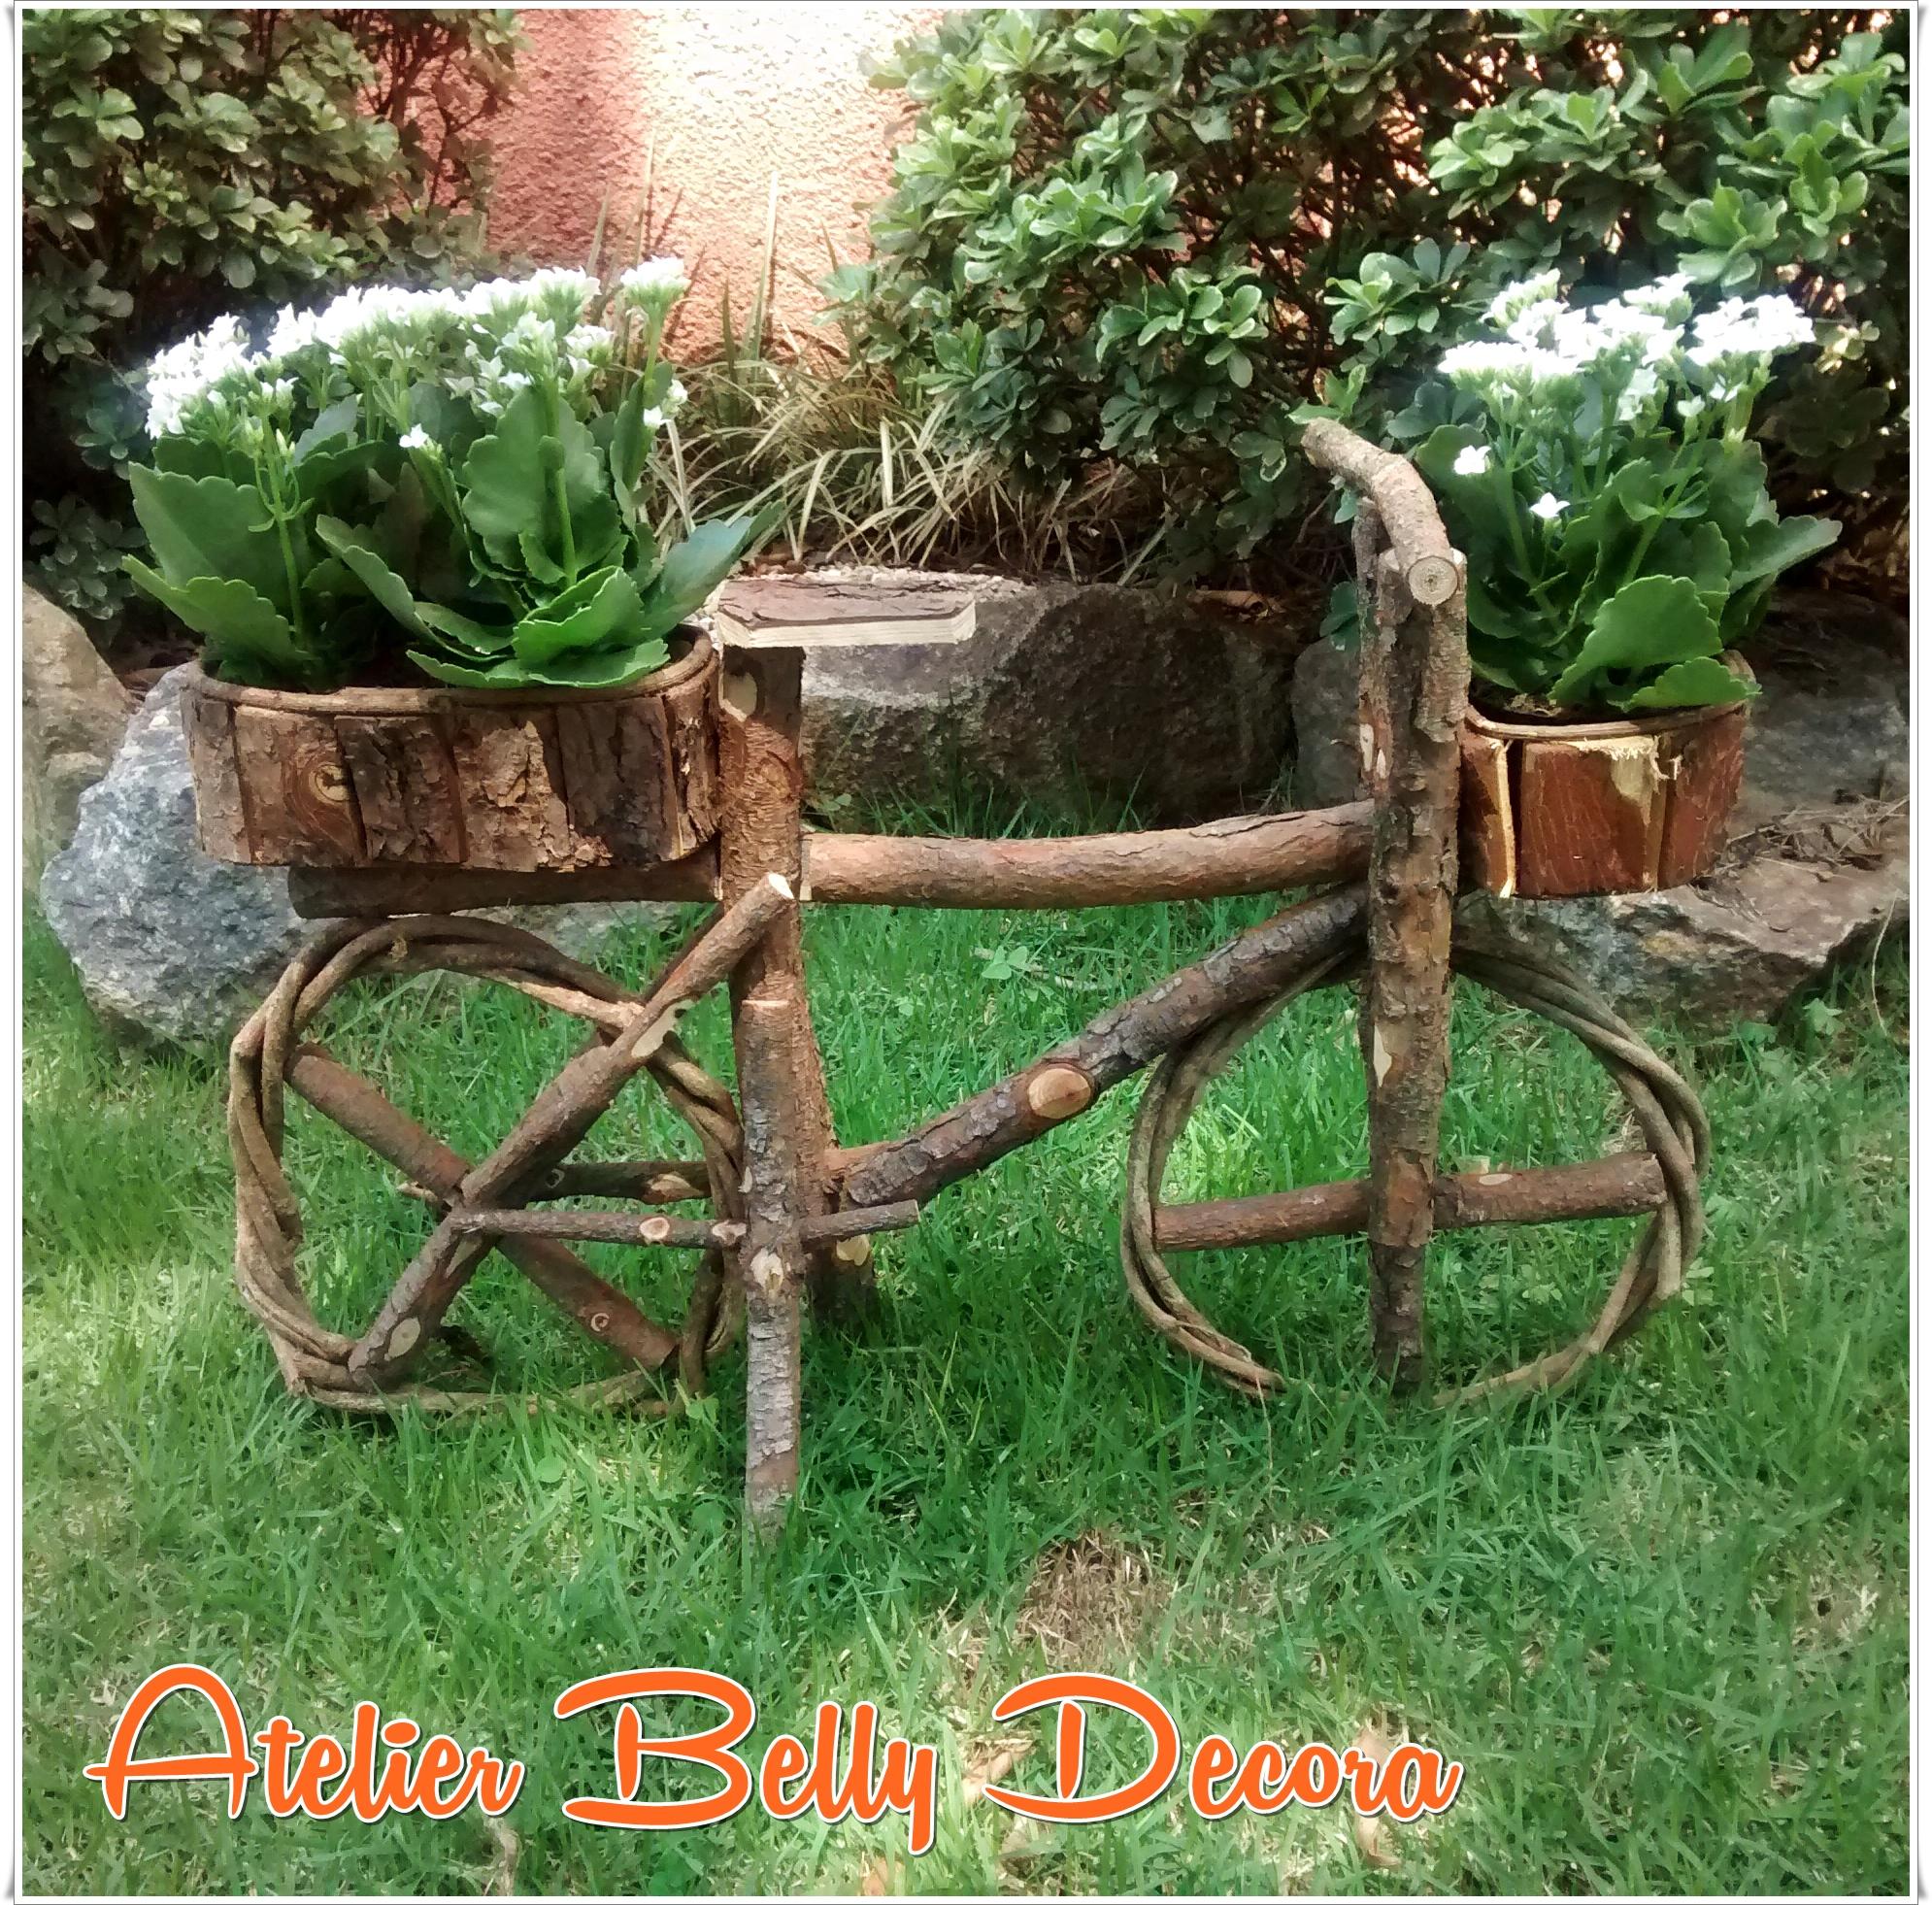 Art Deco Bed Bicicleta C Cachep 244 Madeira Cip 243 Jardim Atelier Belly